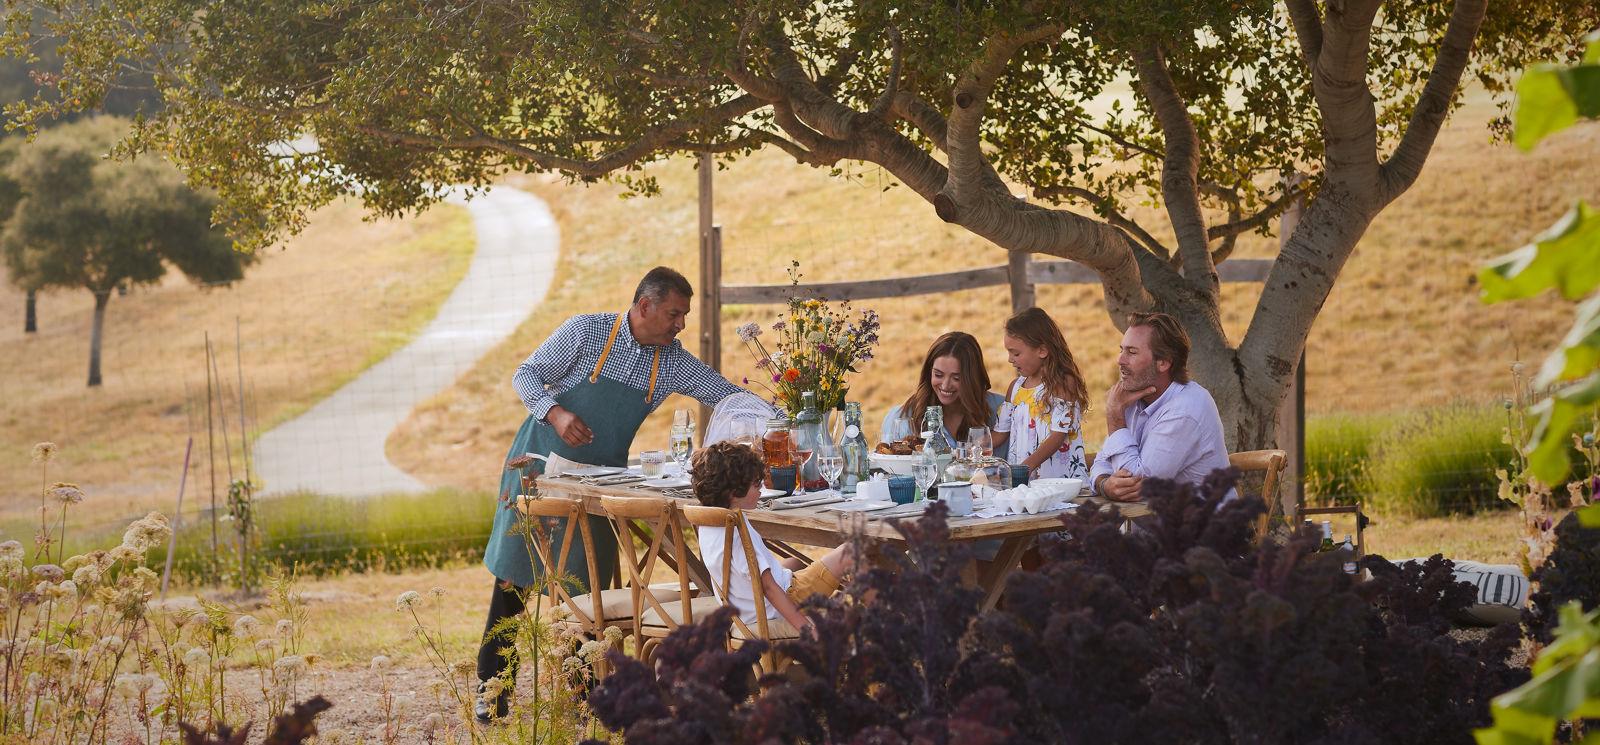 Carmel Valley Ranch_Lifestyle_Organic Garden_Family Breakfast_GJ_0450_v1_current